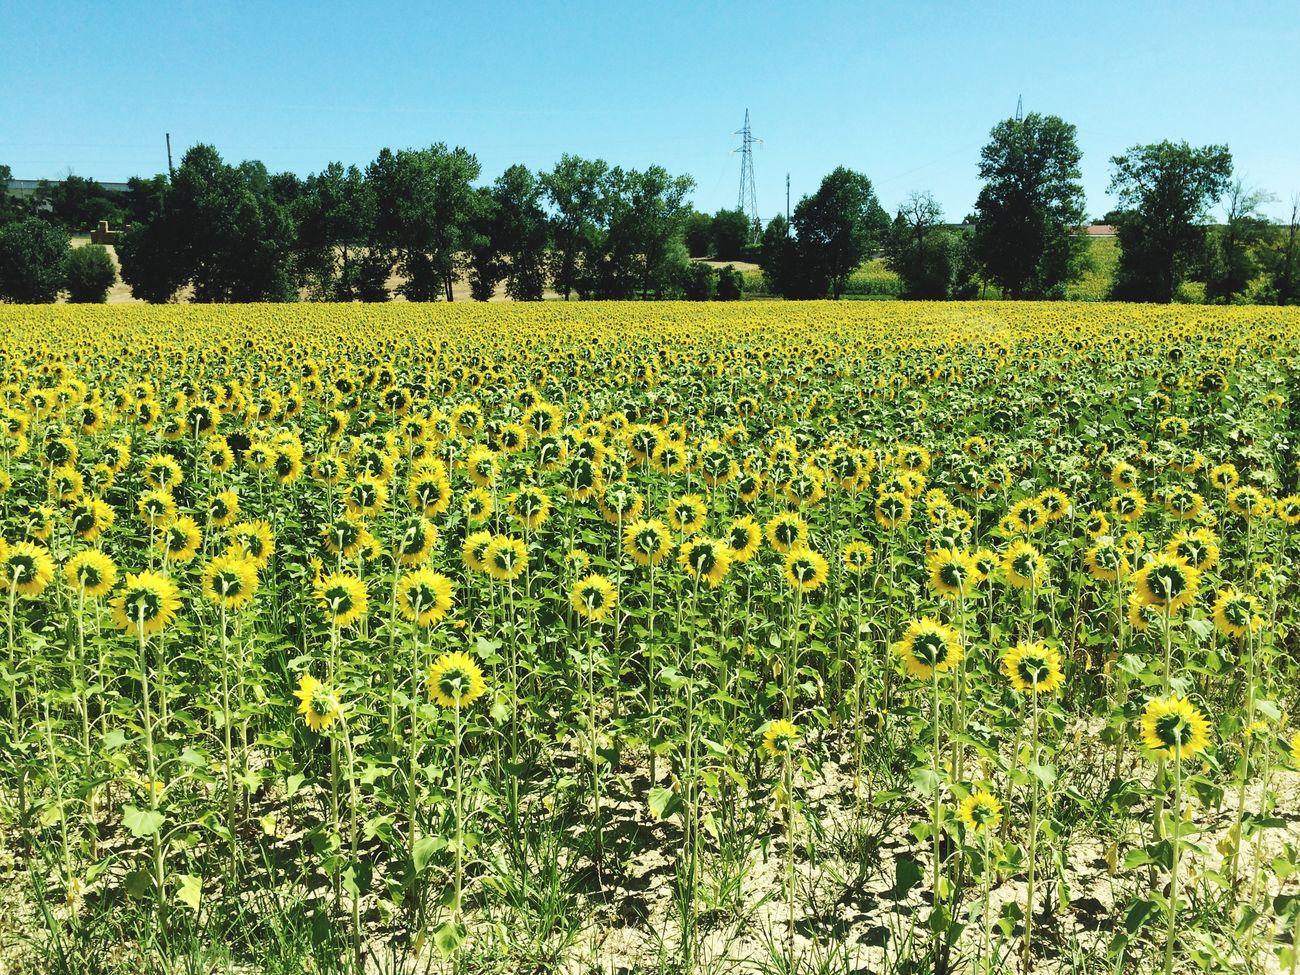 Fano Weekend Girasoli Girasole Sun Sole Sunflower Sunflowers Landscape Landscape_Collection